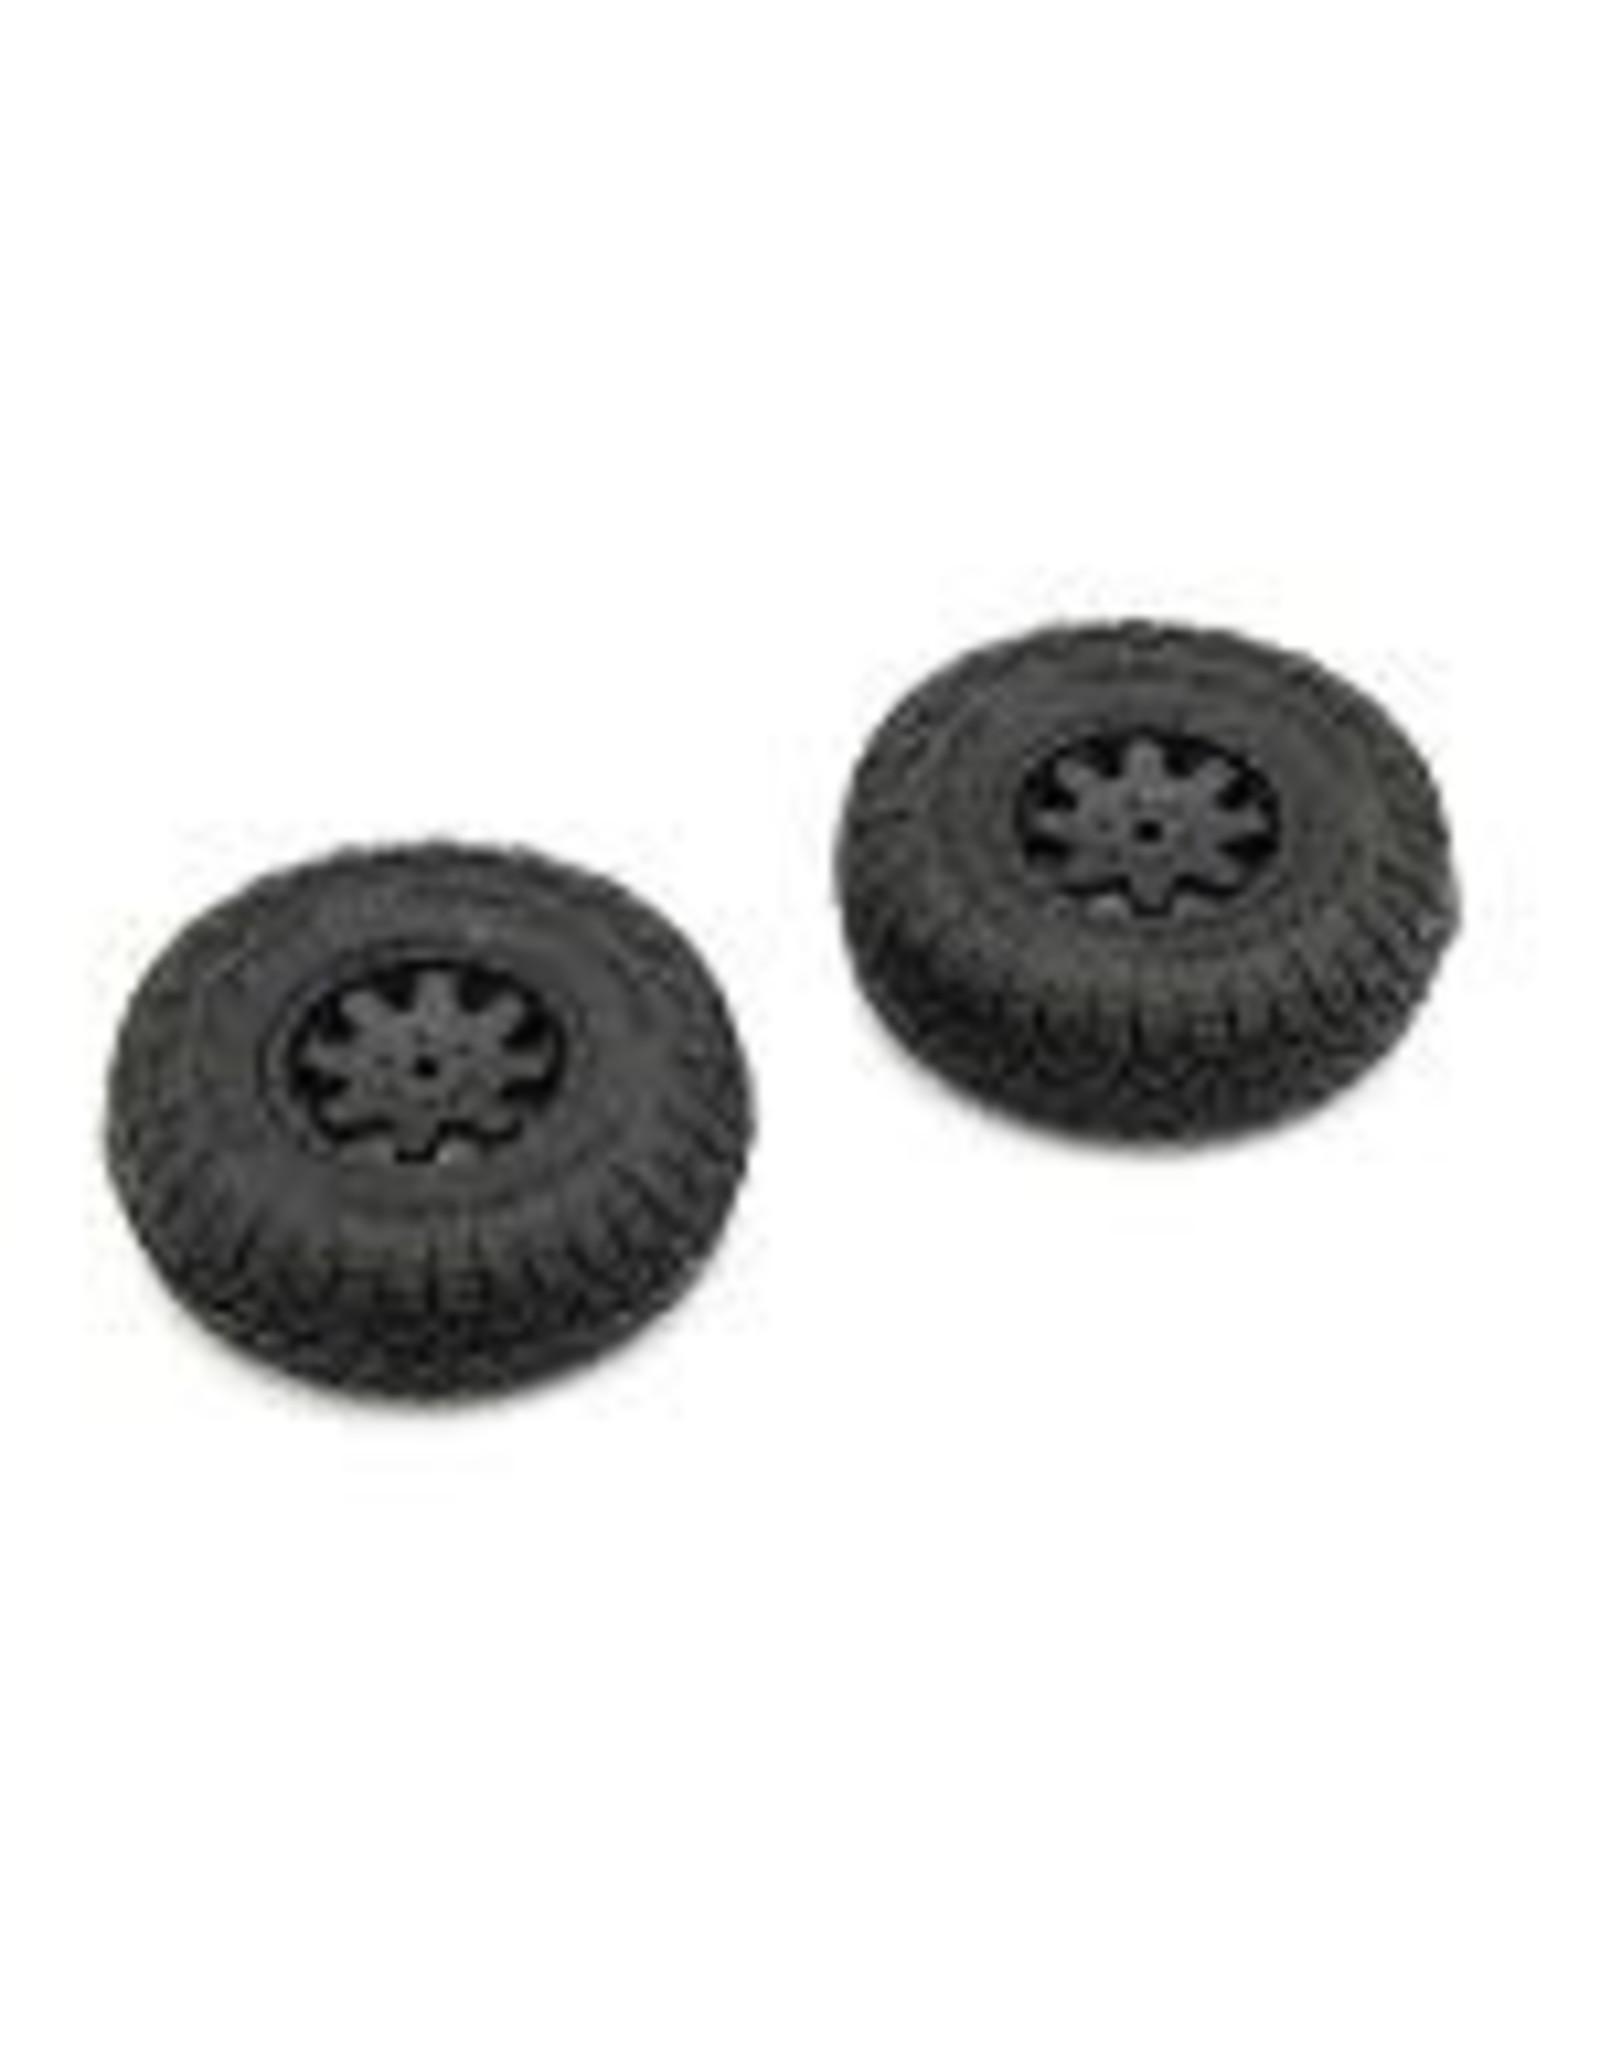 Kyosho Kyosho Premounted Tire/Wheel 2pcs Toyota 4Runner